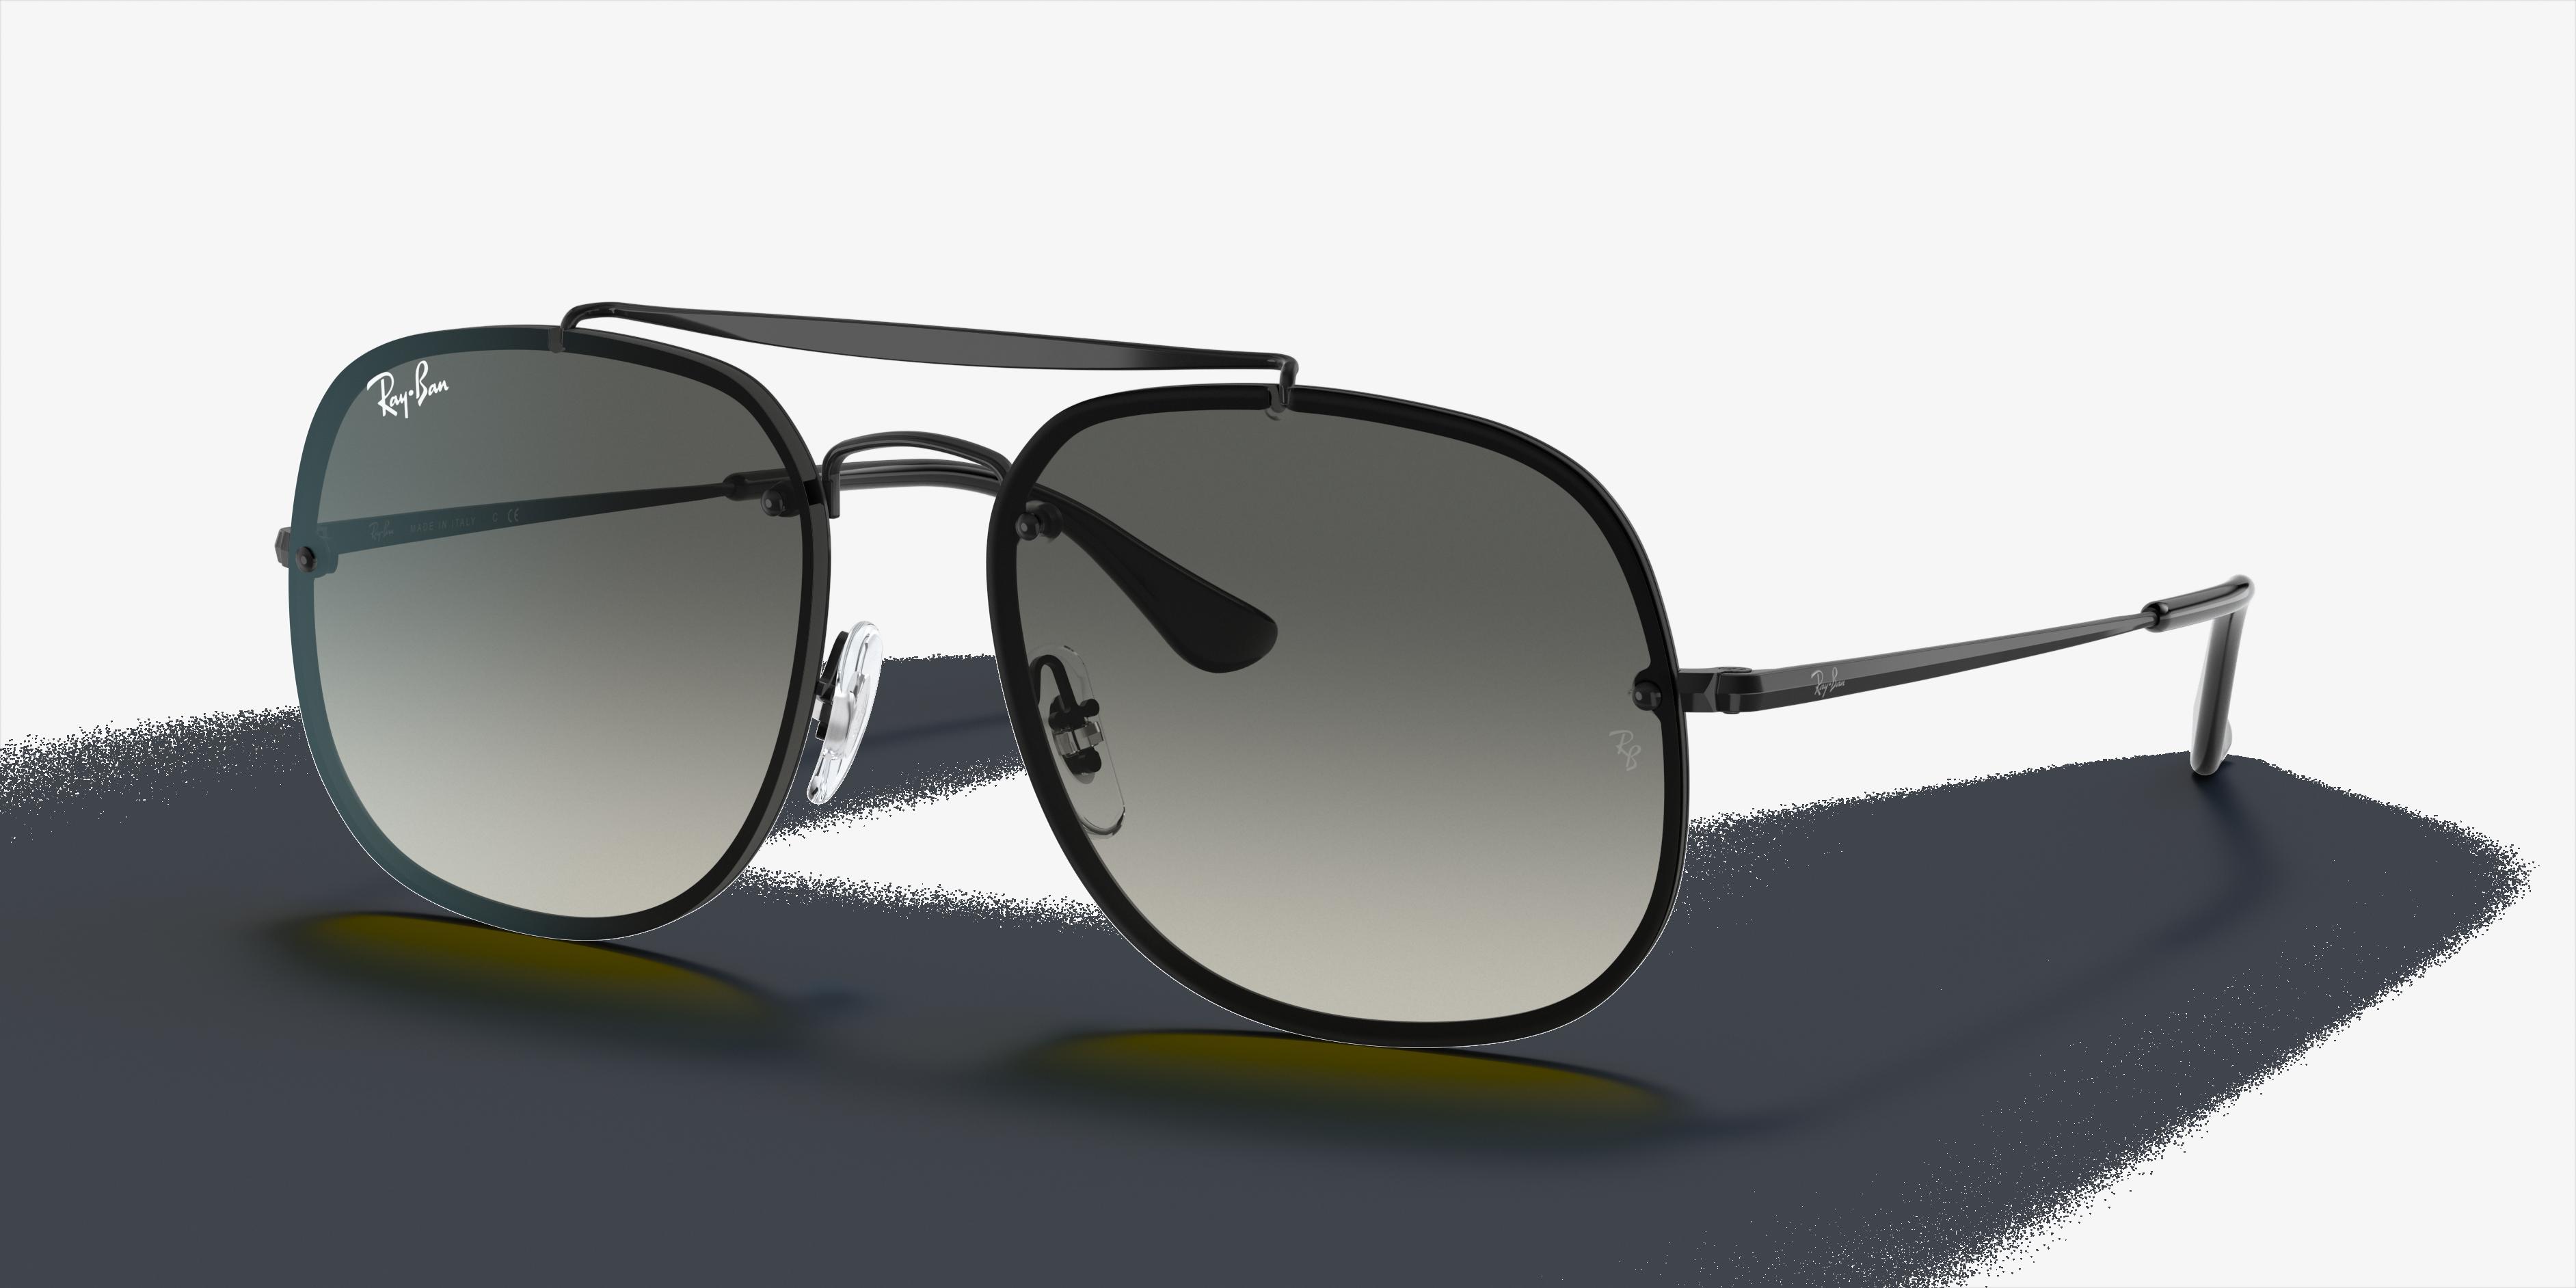 Ray-Ban Blaze General Black, Gray Lenses - RB3583N